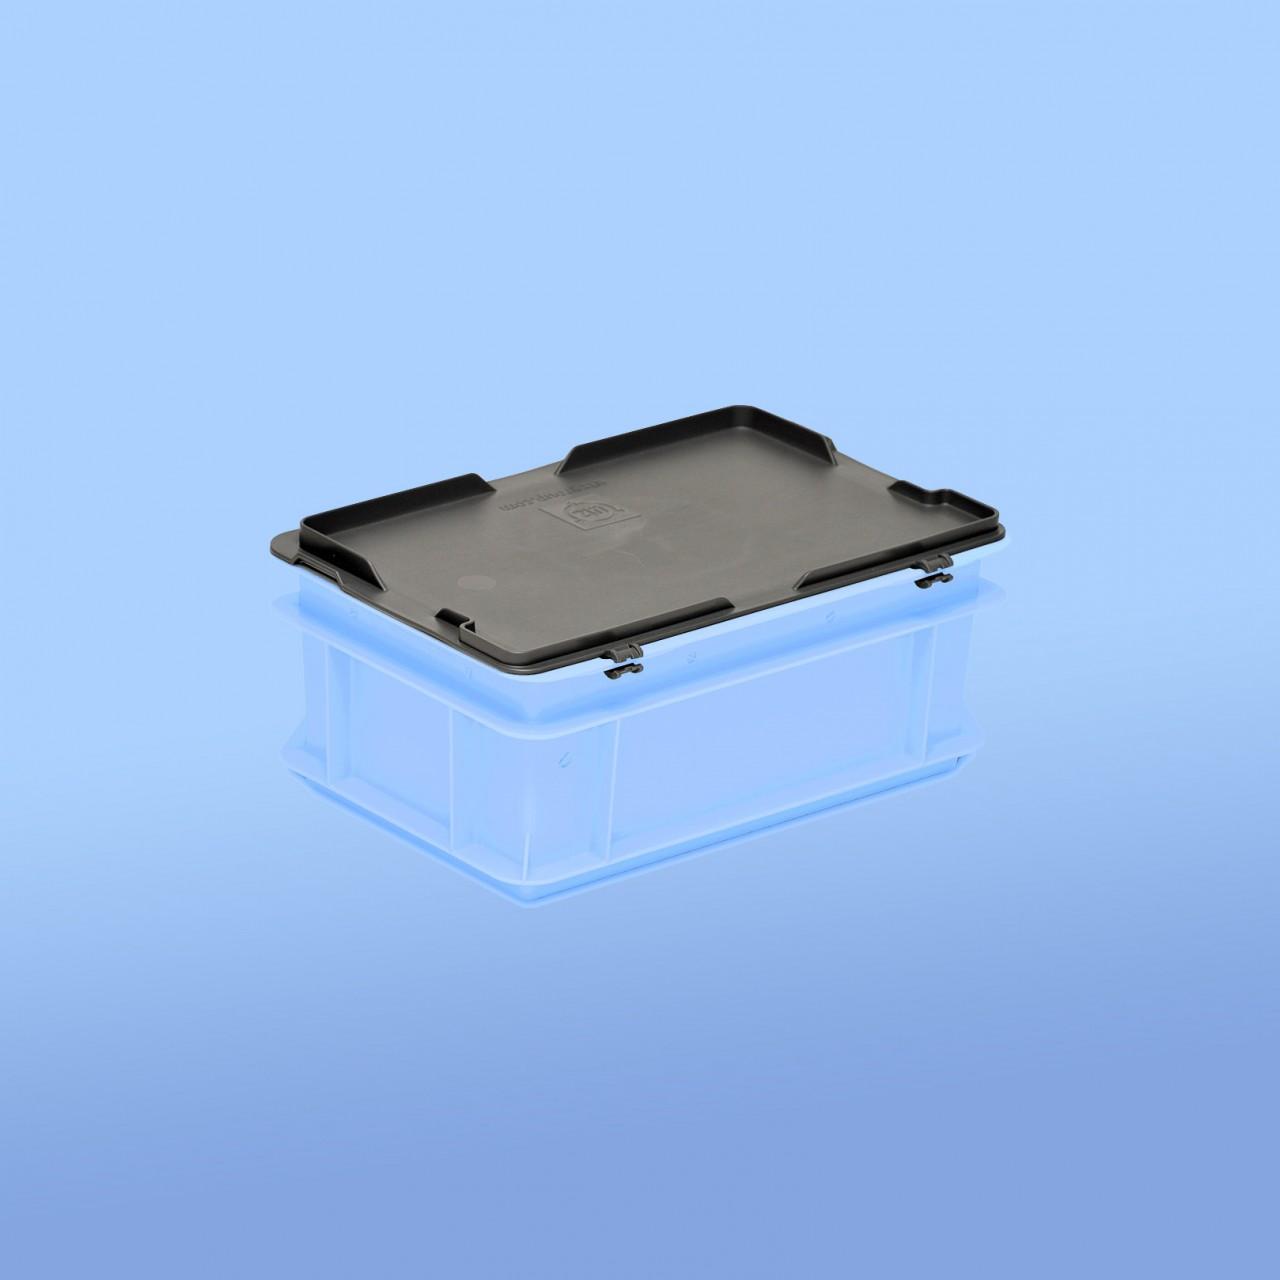 Deckel zu Rako-Behälter |300 x 200 mm